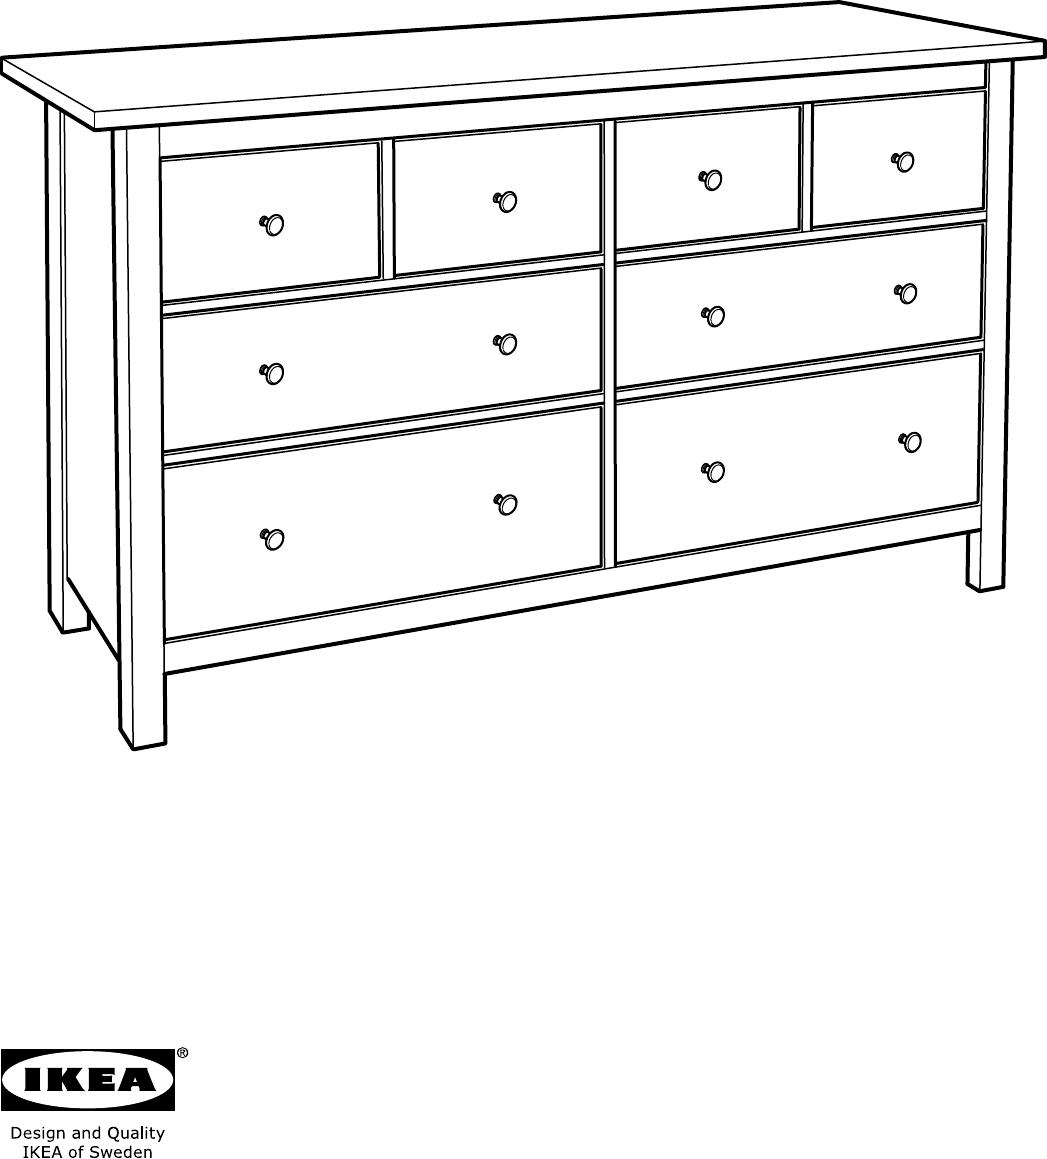 Handleiding Ikea Hemnes Ladekast 8 Lades Pagina 1 Van 32